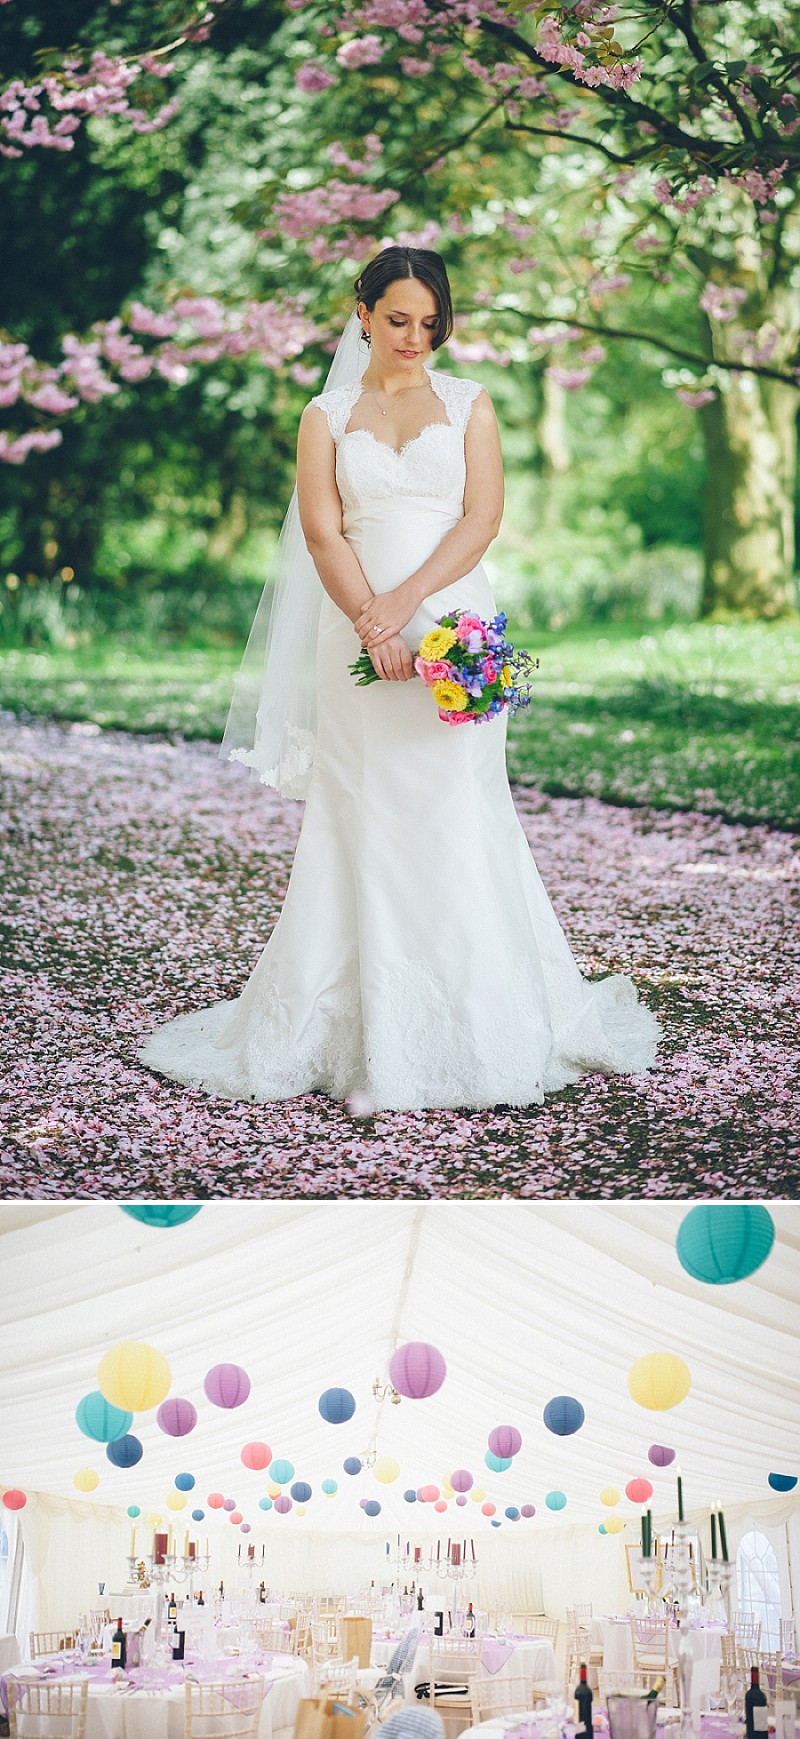 Paloma Blanca Wedding Dresses For Sale 70 Luxury A wedding at Newburgh